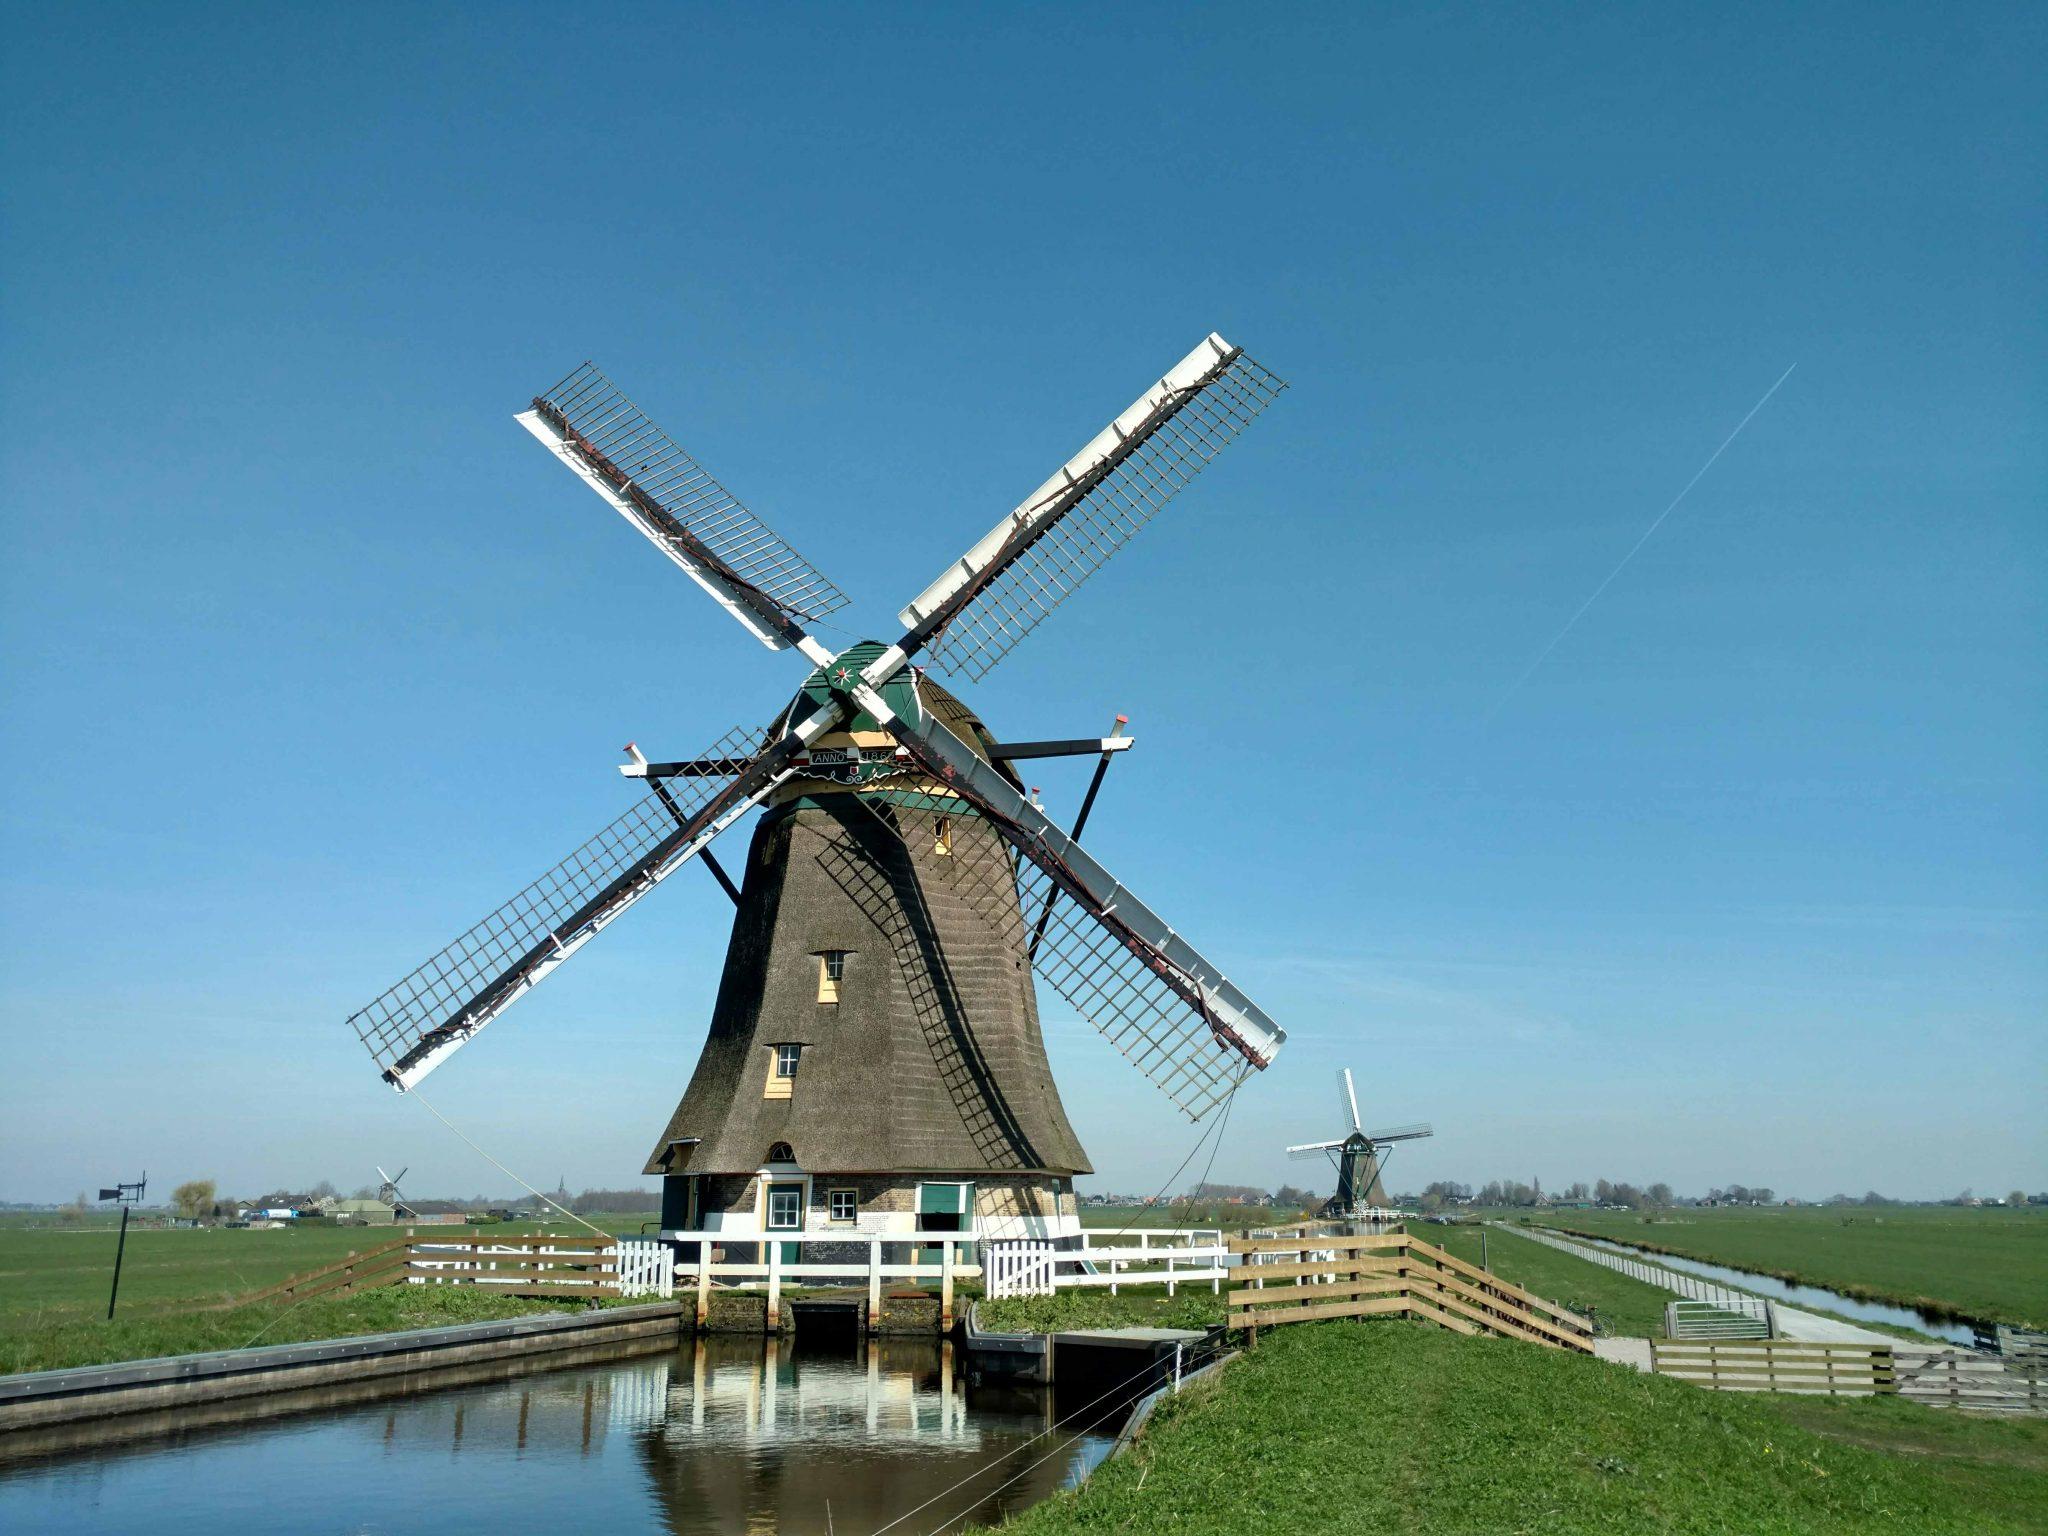 Windmill_Dutch_pilgrims_route_nl